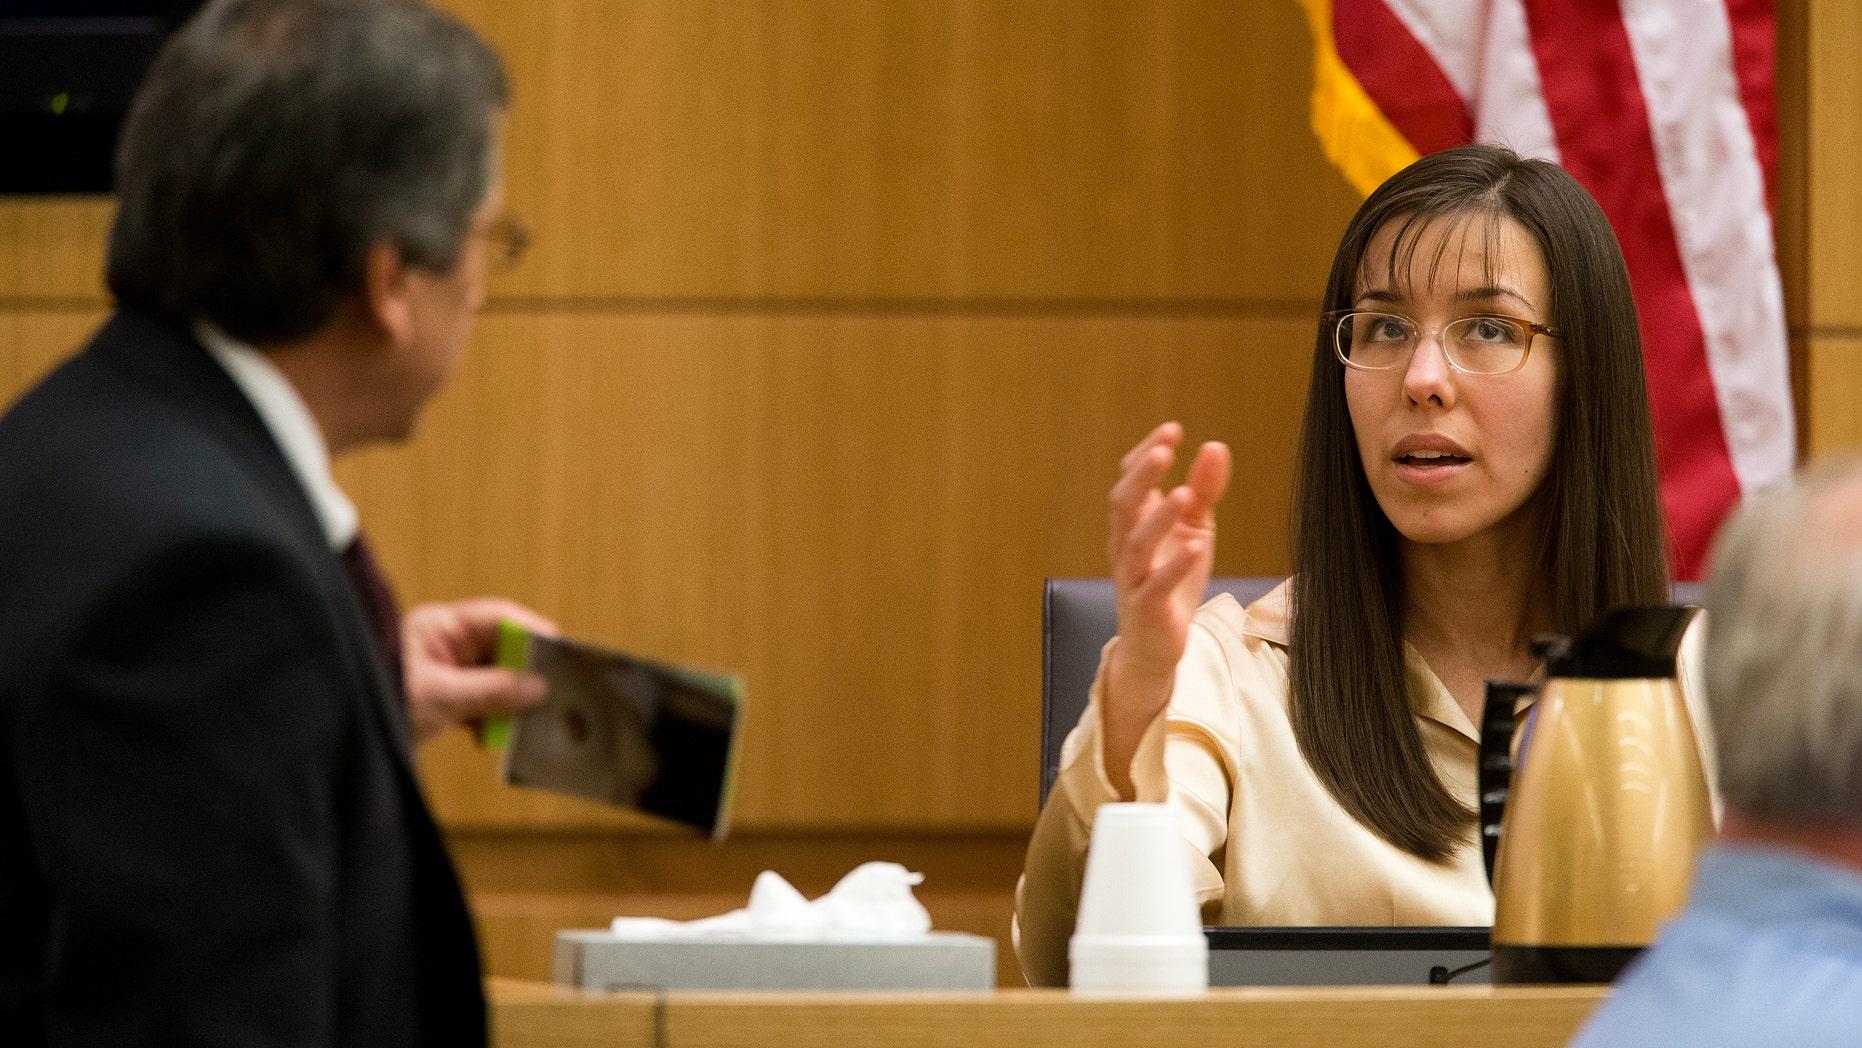 Feb. 26, 2013: Prosecutor Juan Martinez, left, cross examines Jodi Arias a during her trial in Maricopa County Superior Court.